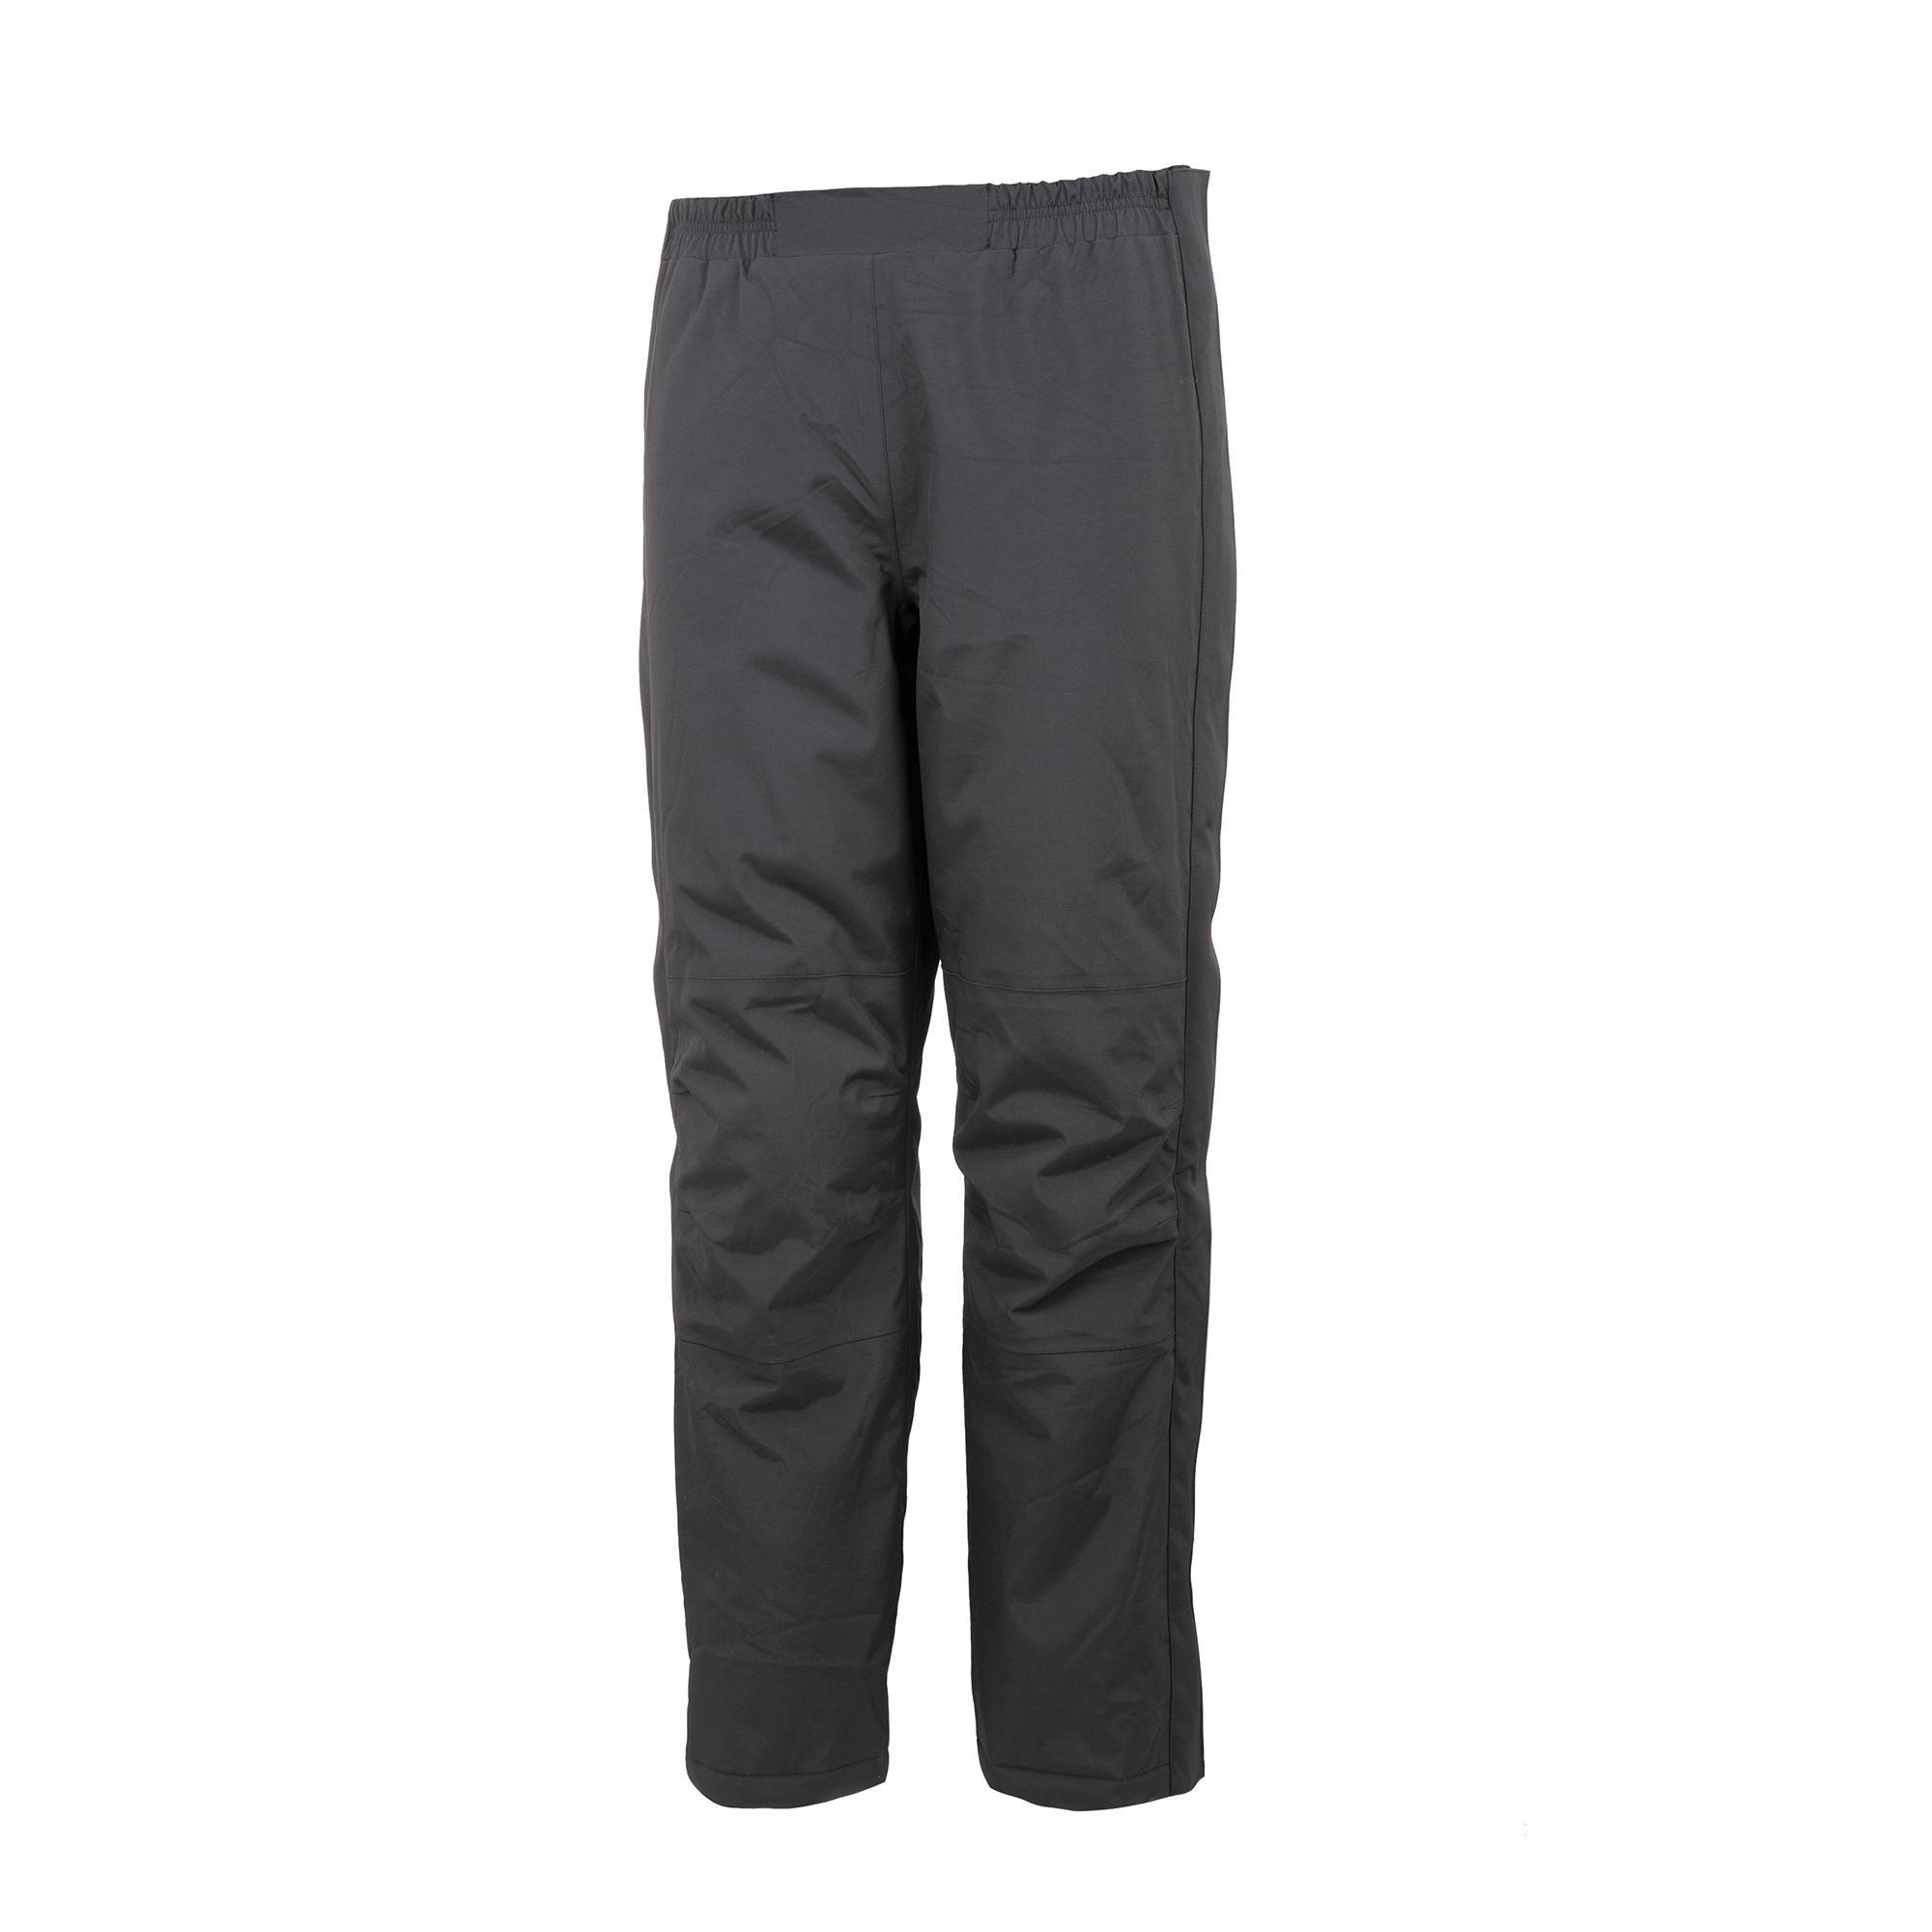 Pantaloni Panta Urbis 5g Nero